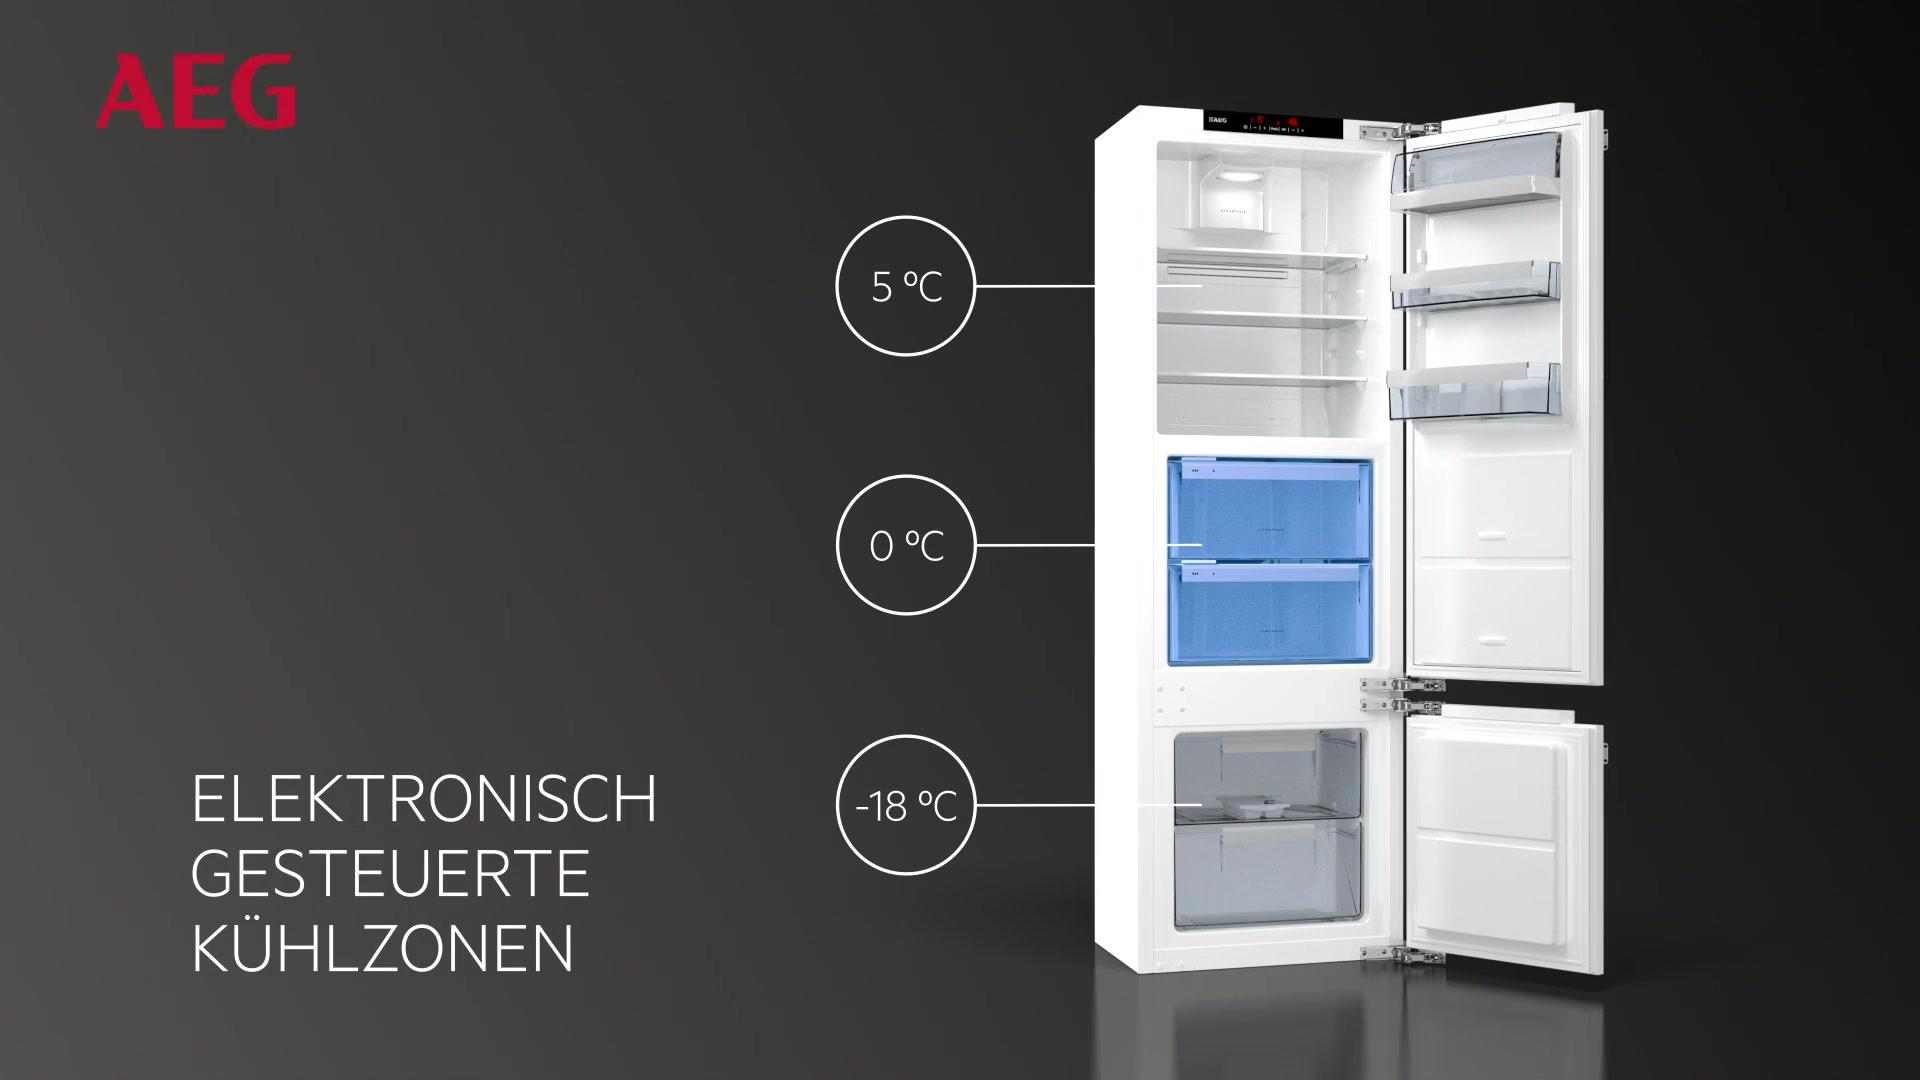 Aeg Kühlschrank Einbau : Aeg aeg integrierbarer einbau kühlschrank santo sfe zc a